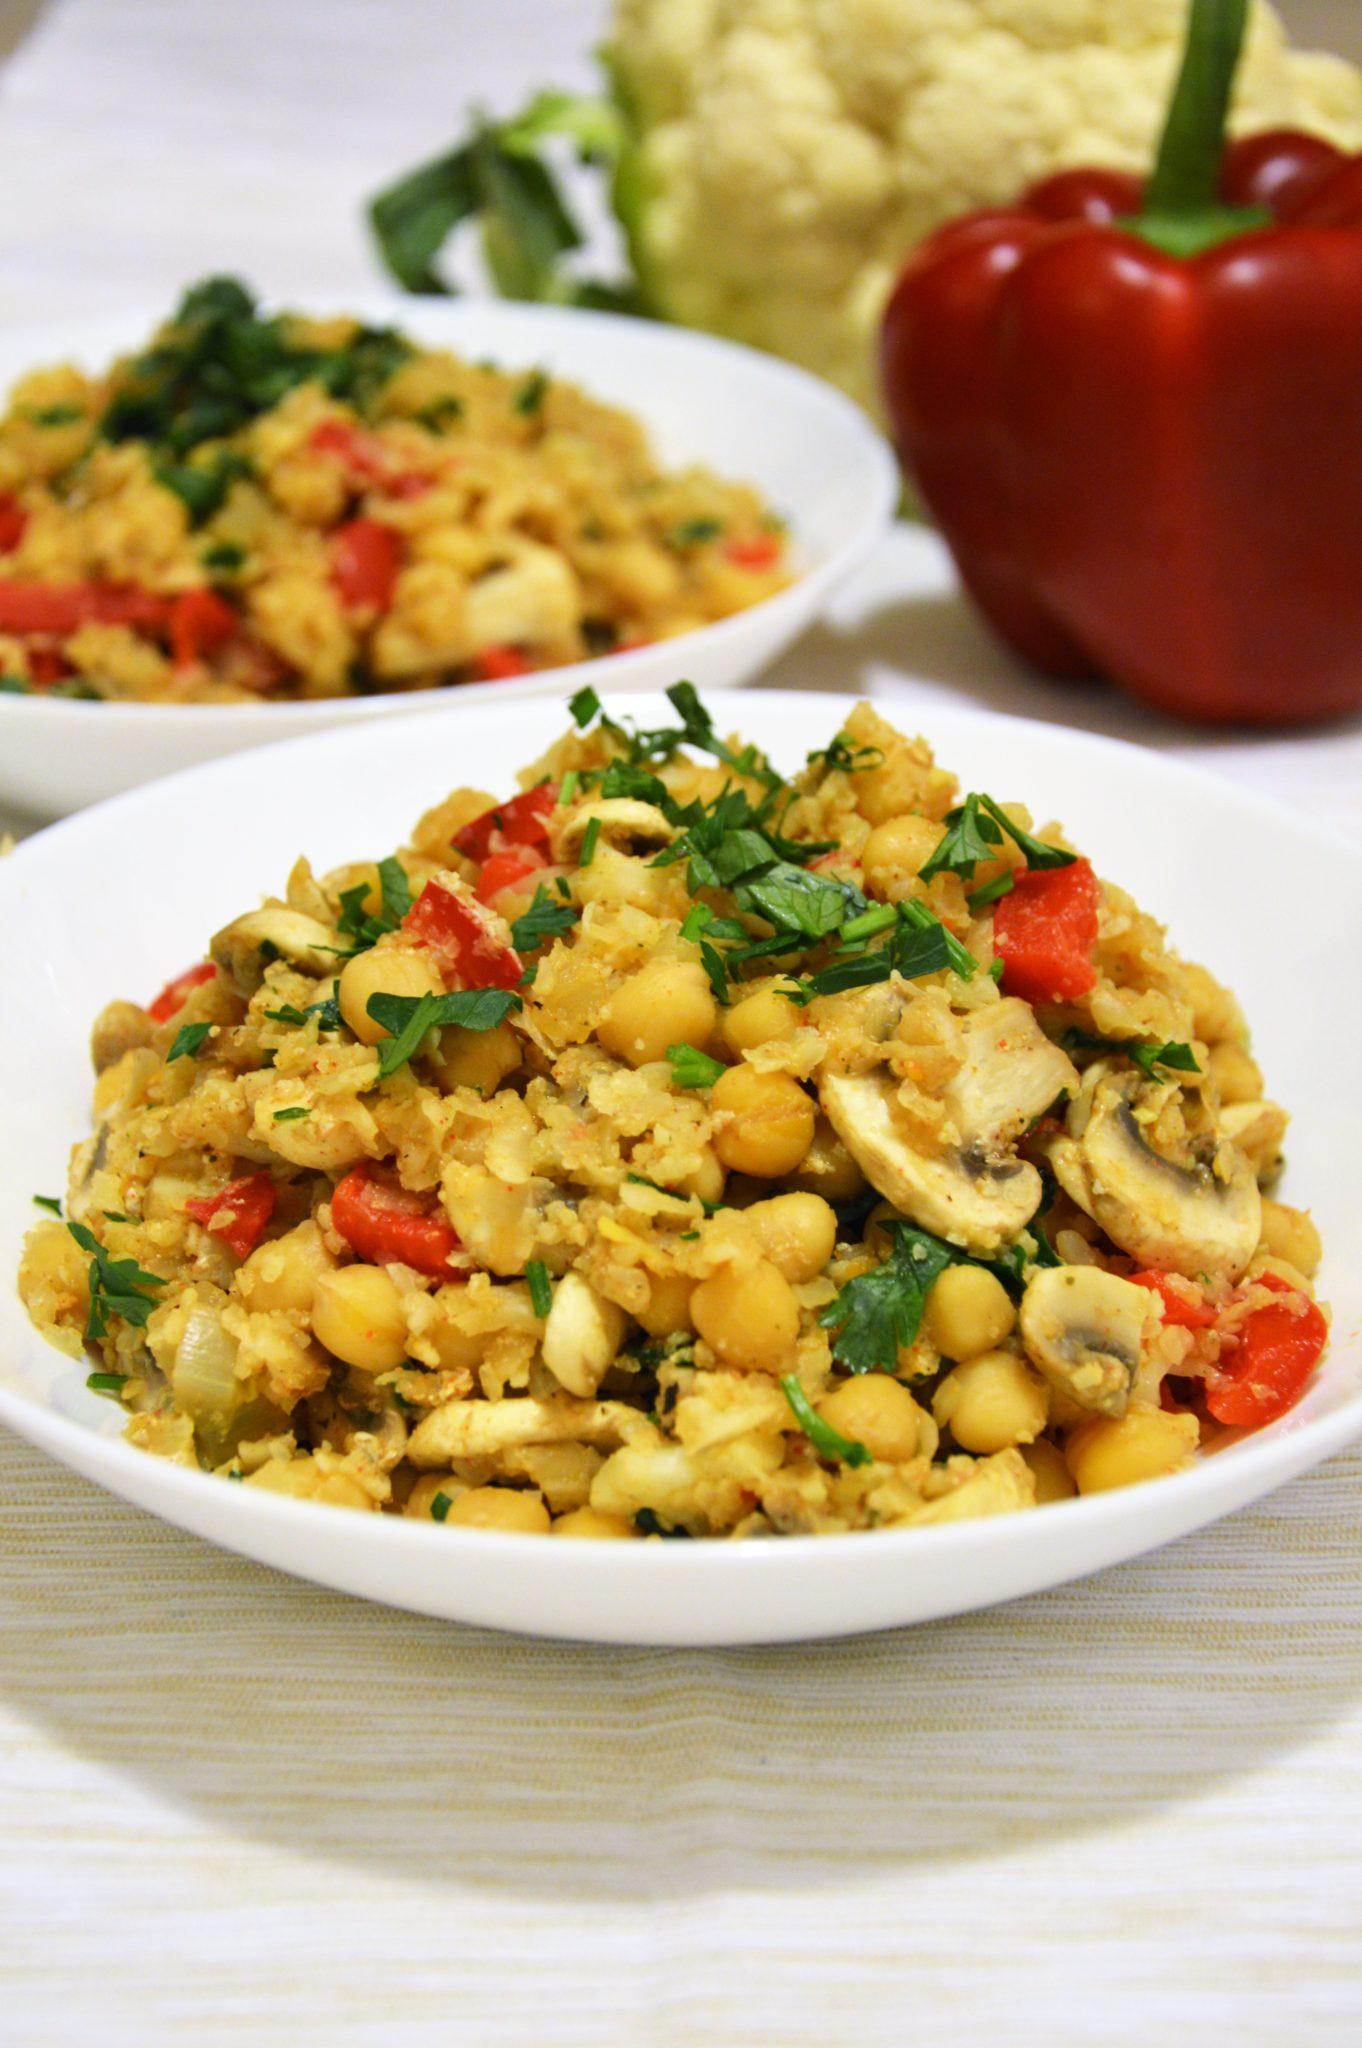 Kolacja bez mięsa - ryż z kalafiora